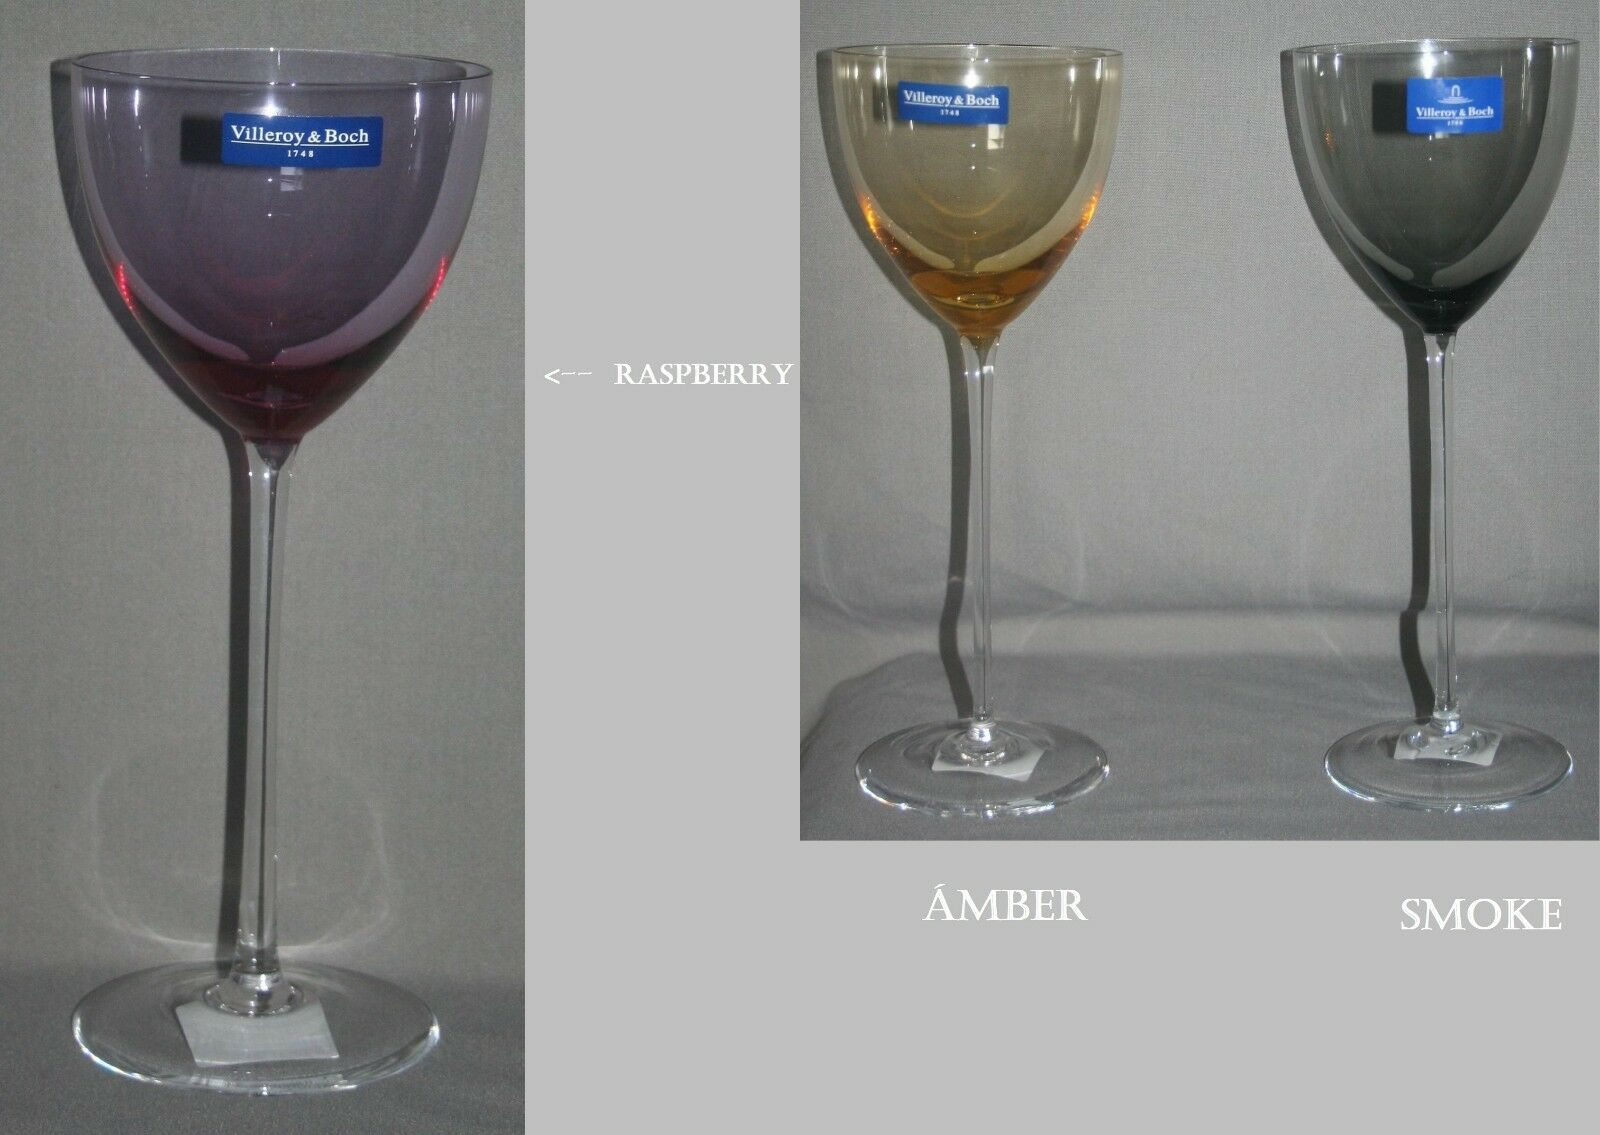 1B 1B 1B WARE - 4 er SET - Villeroy & Boch -MANKAI- Wasserkelch SEKT GLAS Farbe  SMOKE | Charmantes Design  282e88